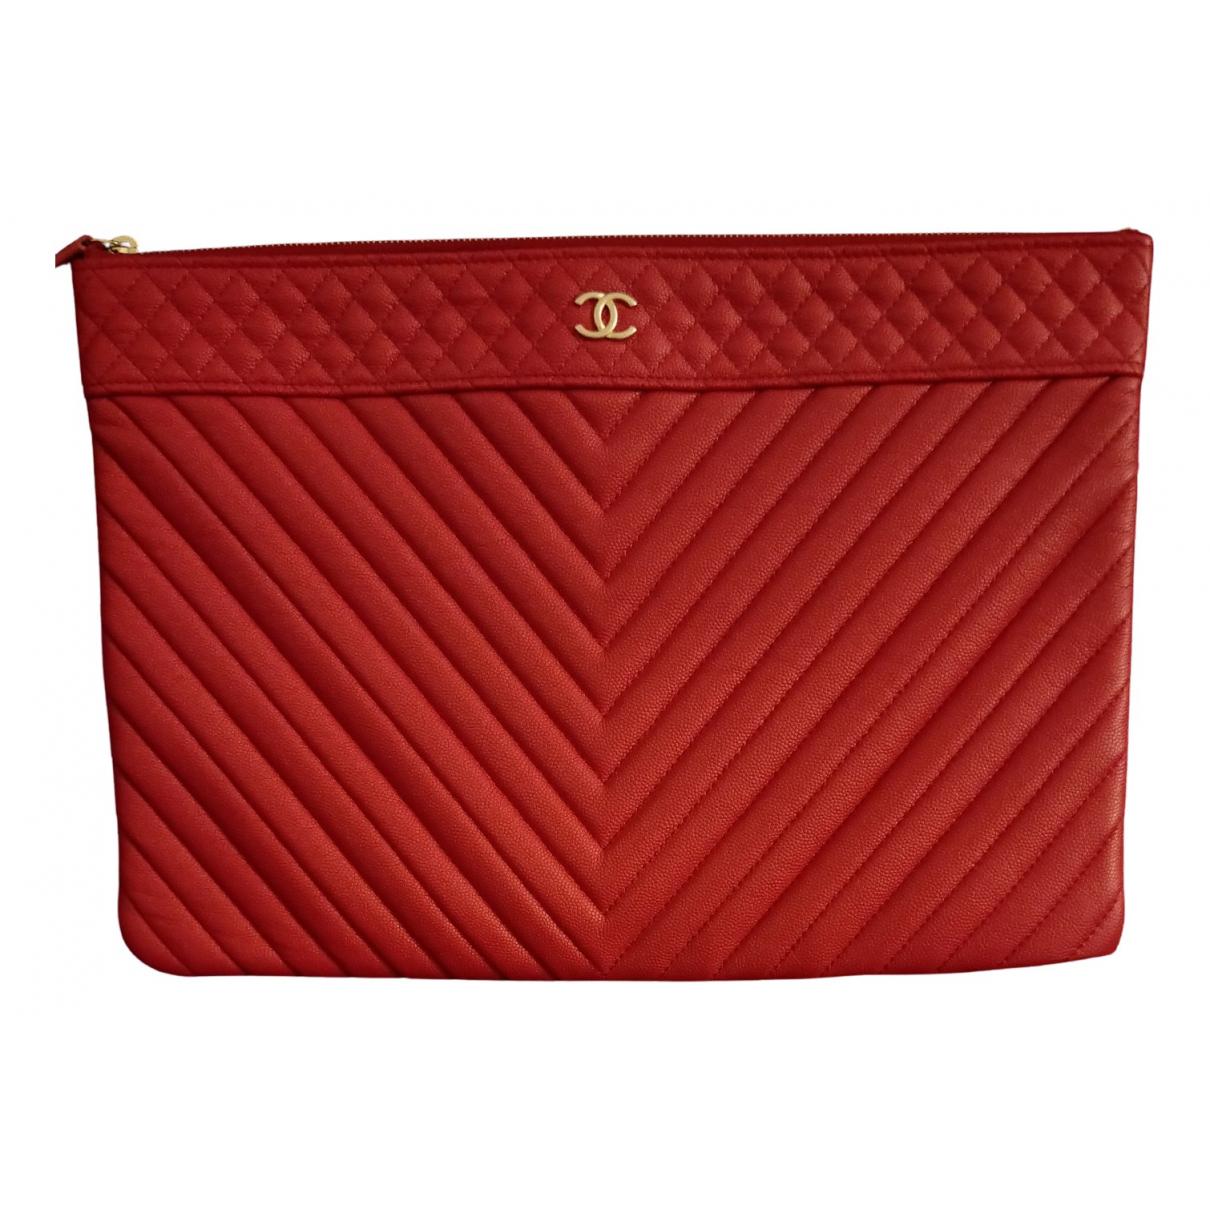 Chanel \N Clutch in  Rot Leder